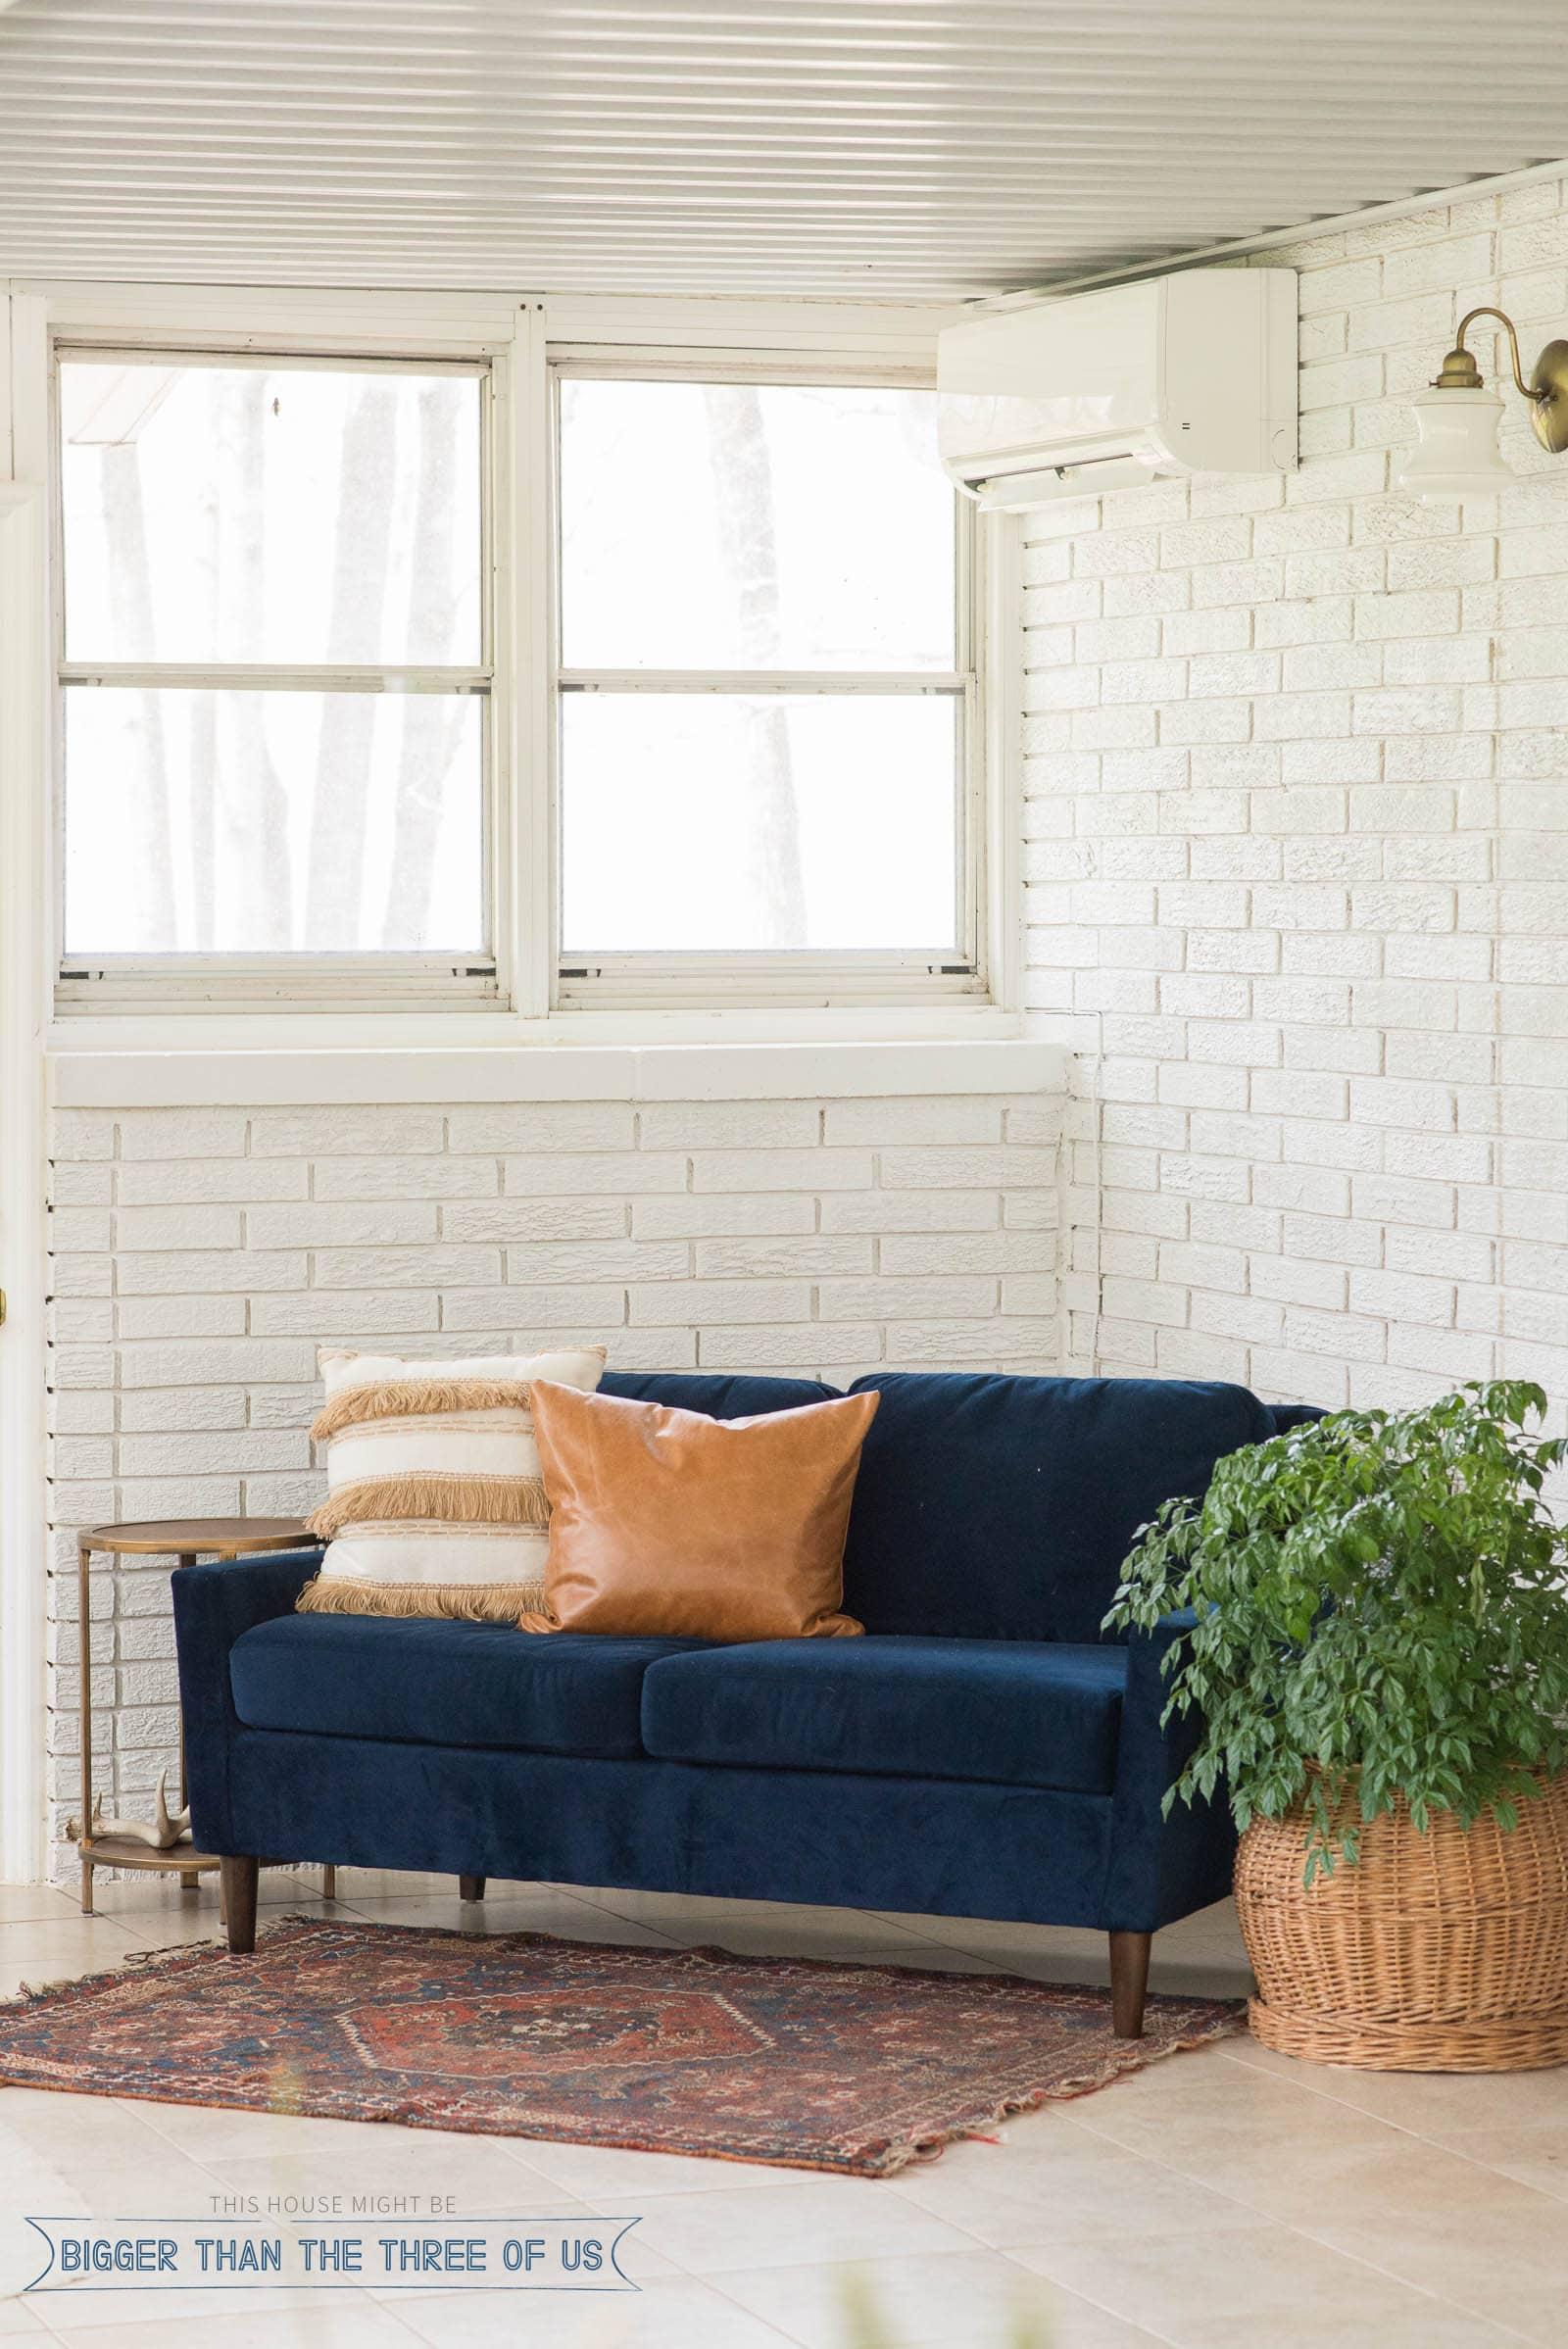 Painting interior brick in the sunroom and adding a mini split